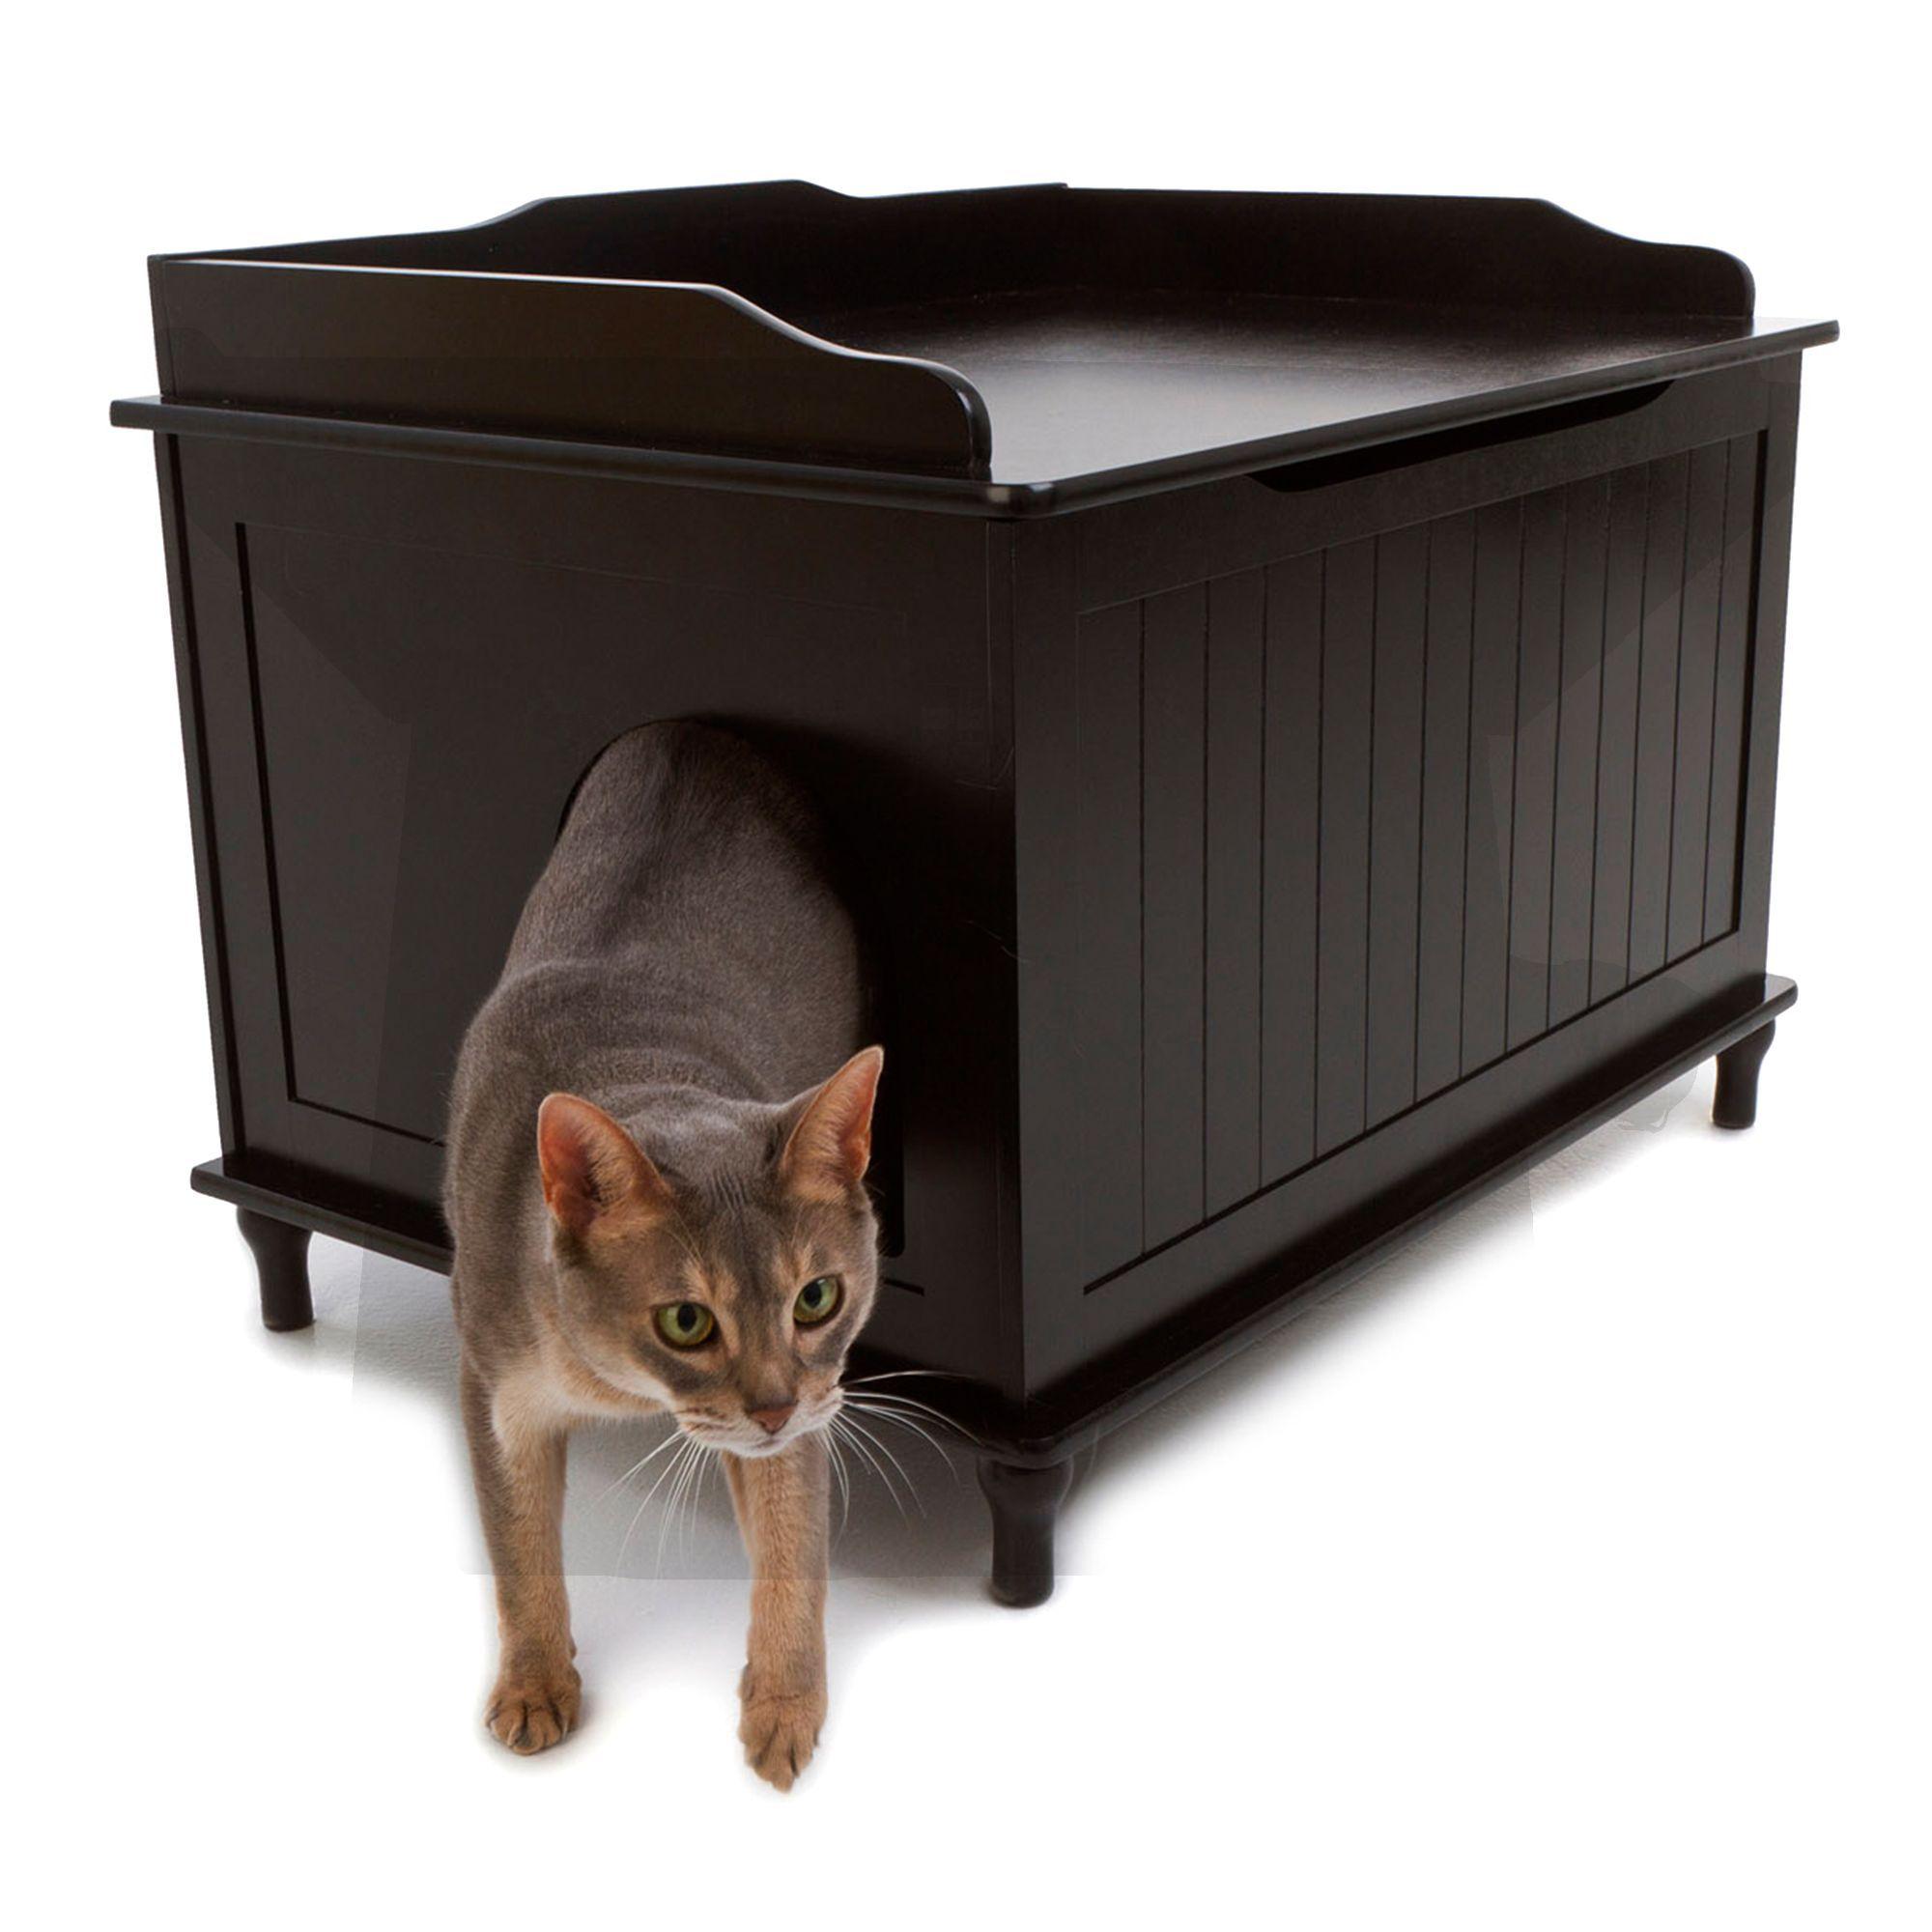 Designer Catbox Cat Litter Box Enclosure Litter box